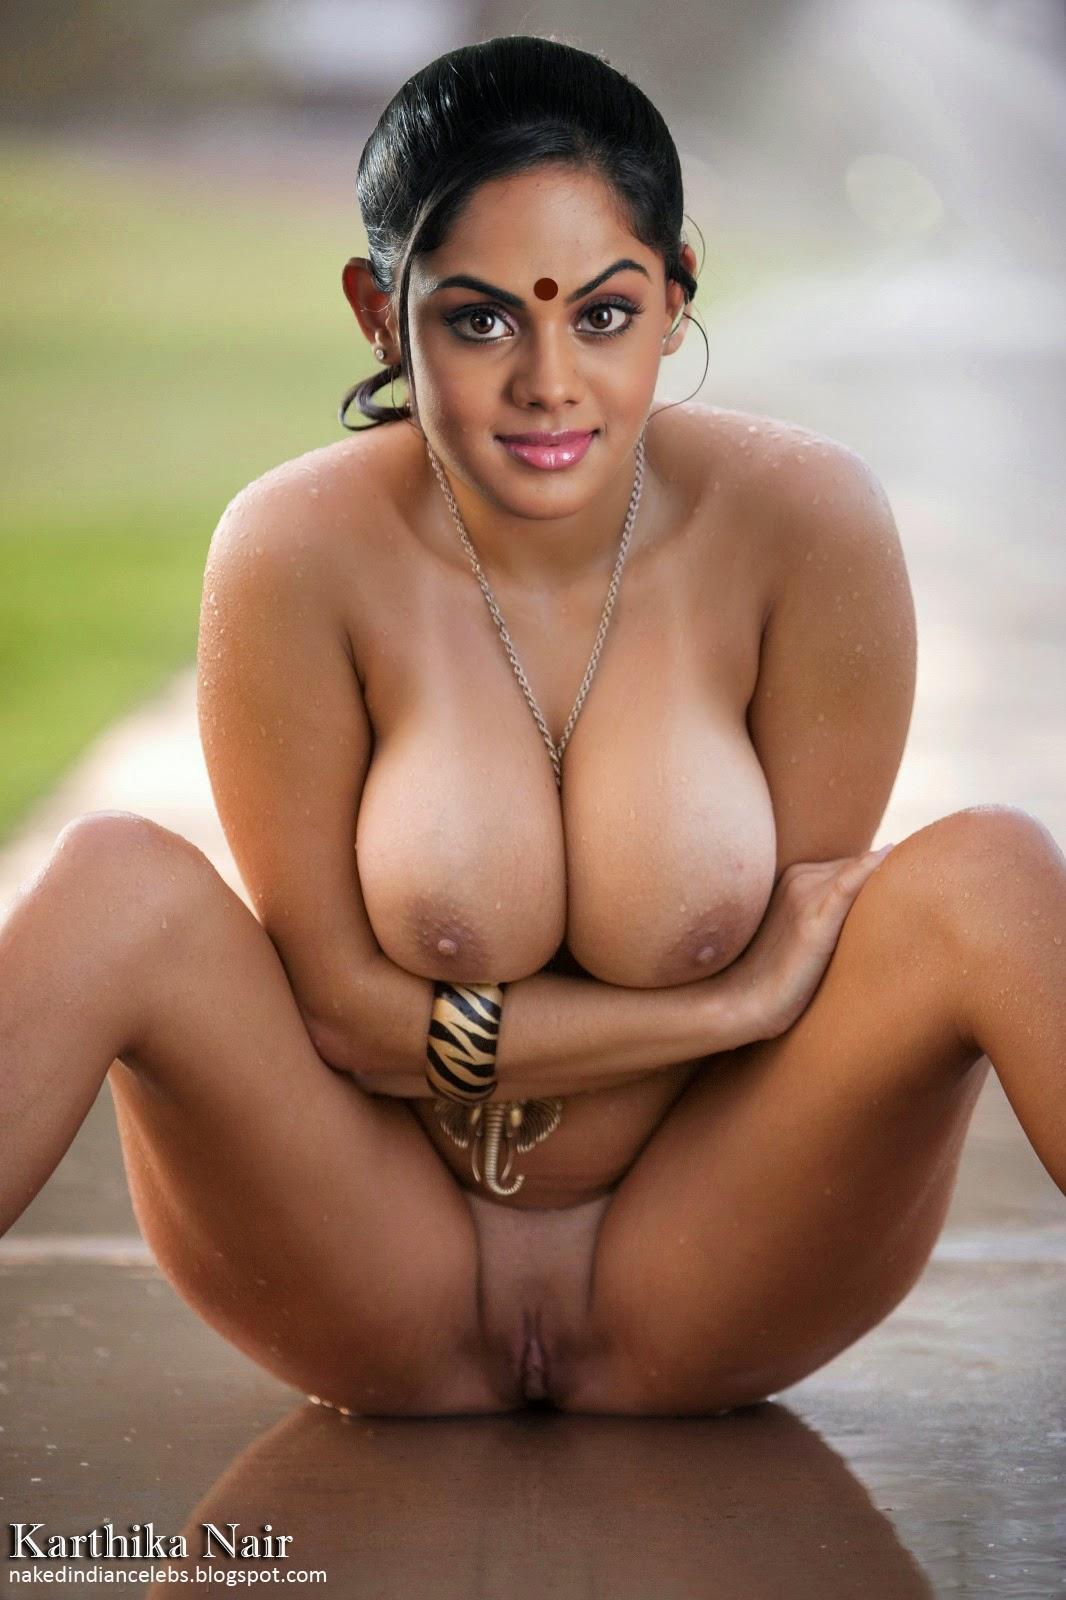 Actress Karthika Nair's Nude Movie Item Song in Airport